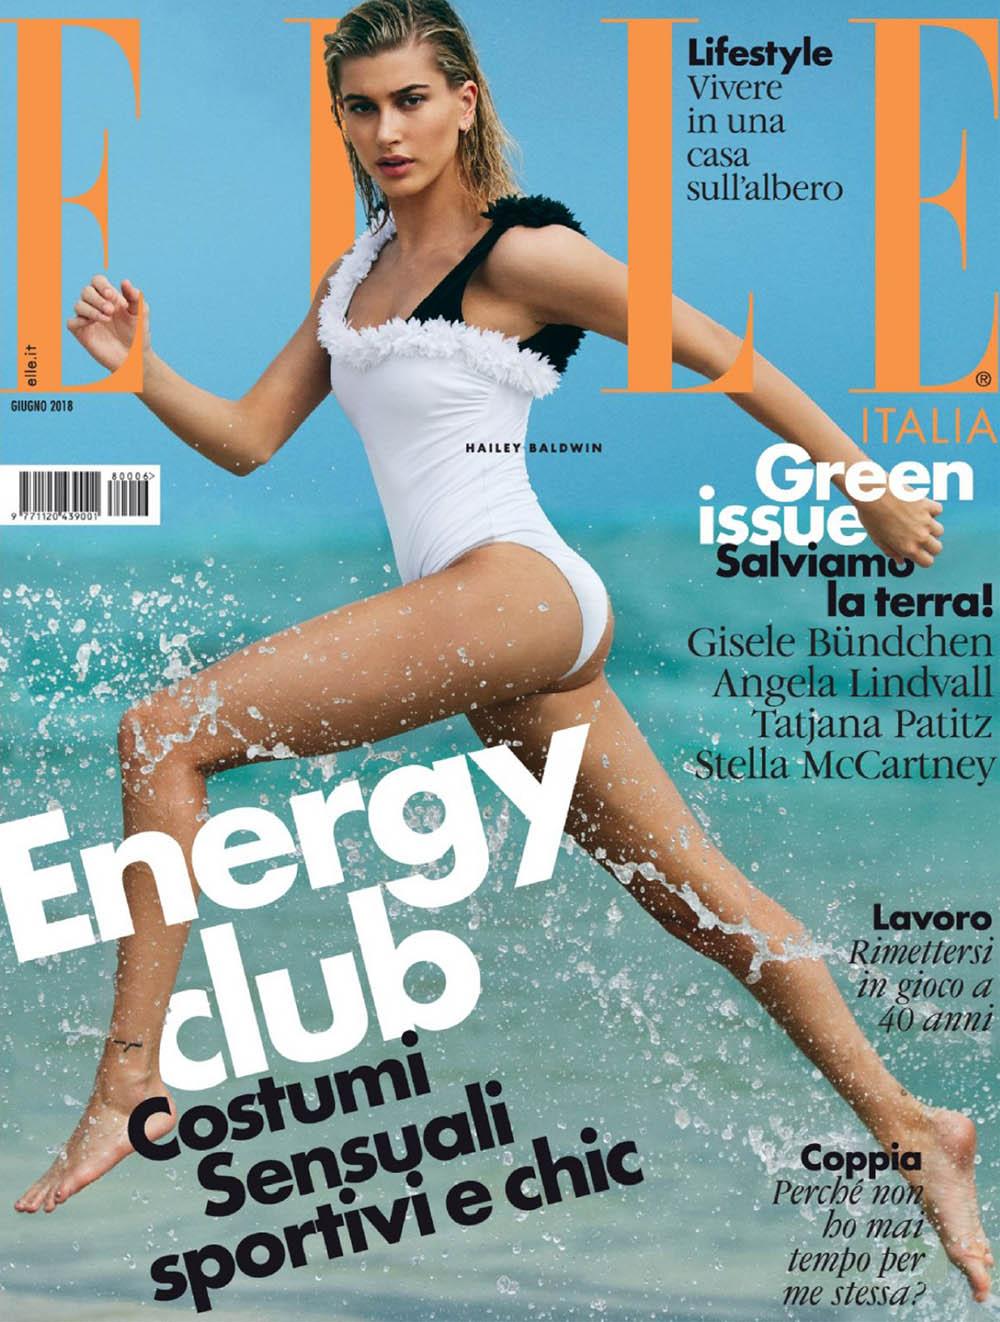 Hailey Baldwin covers Elle Italia June 2018 by Michael Sanders